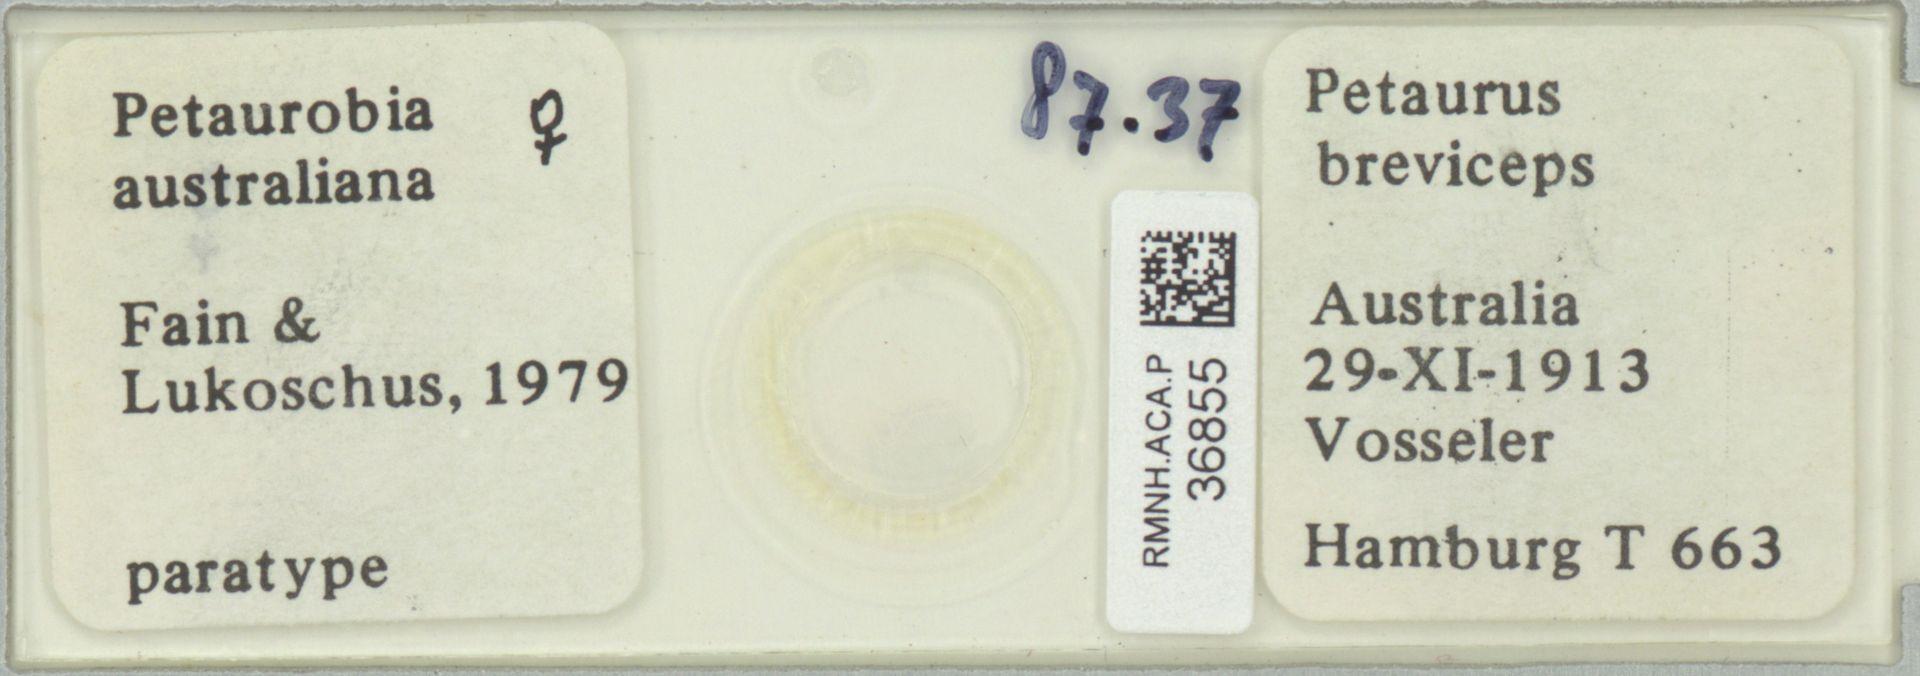 RMNH.ACA.P.36855   Petaurobia australiana Fain & Lukoschus 1979